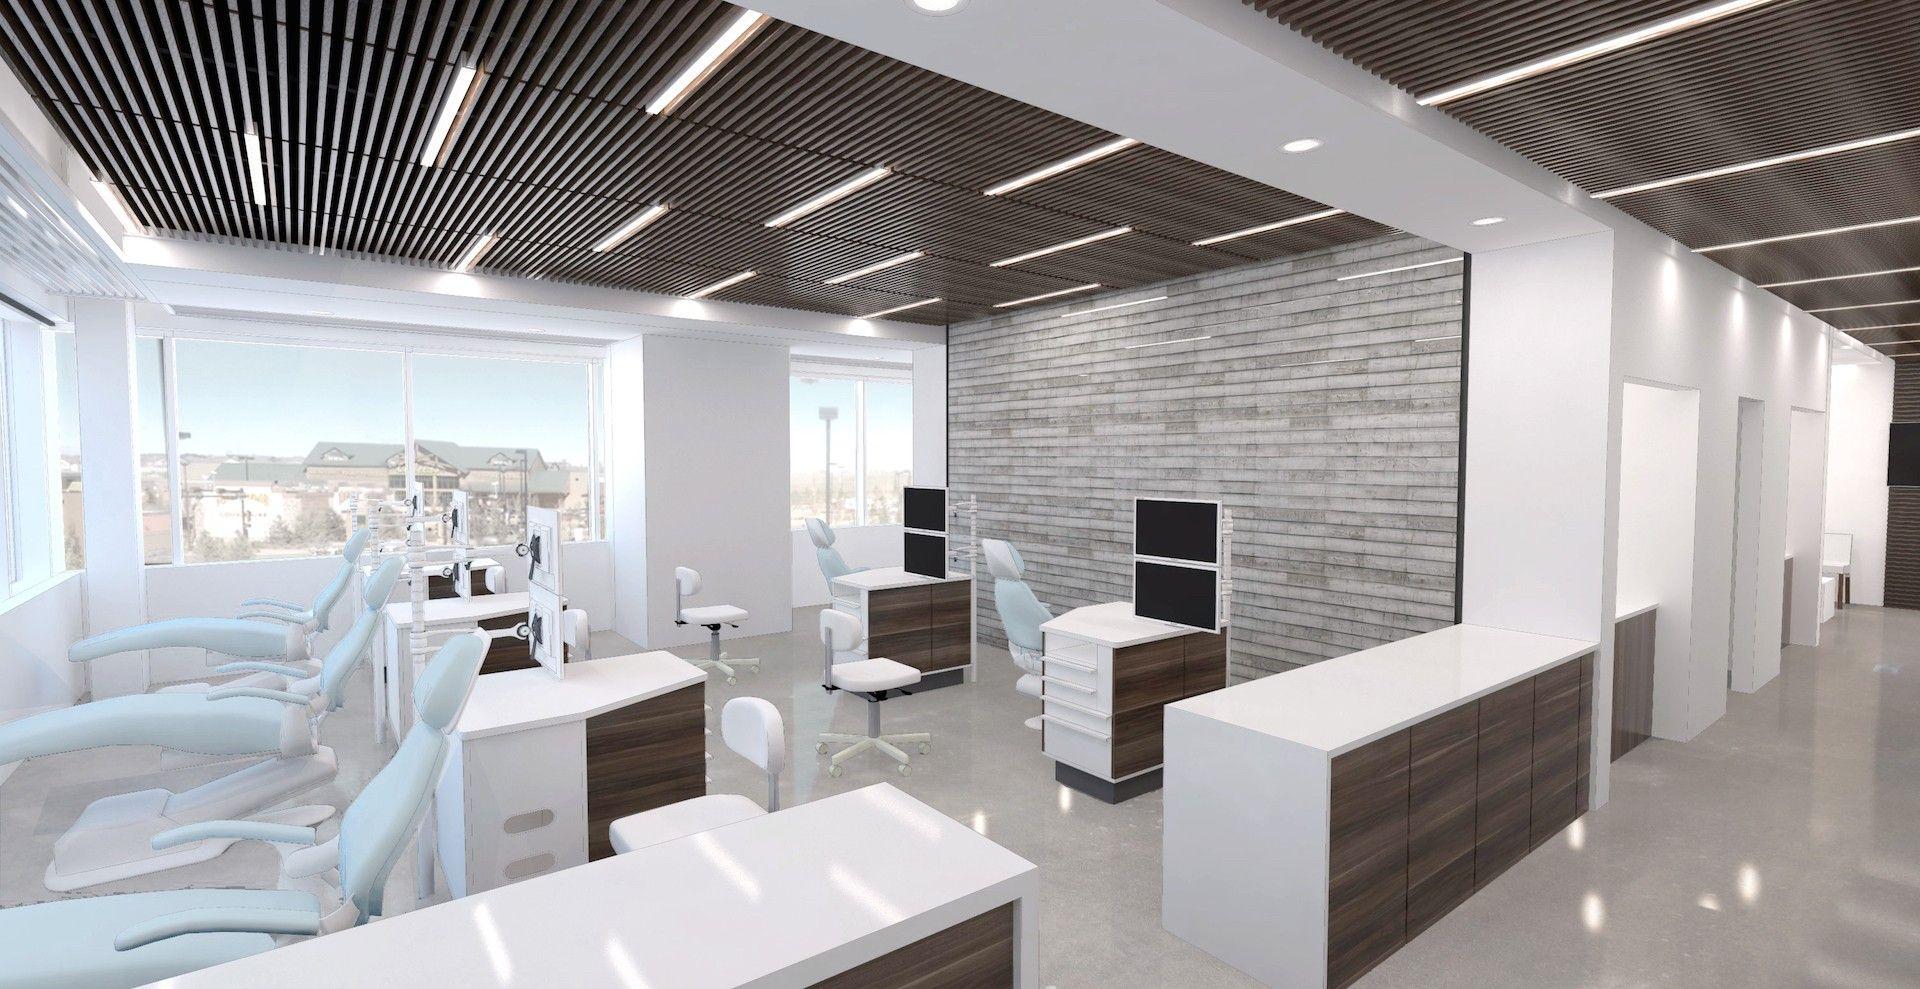 orthodontic office remodels | Orthodontic Office Remodel. Dental ...